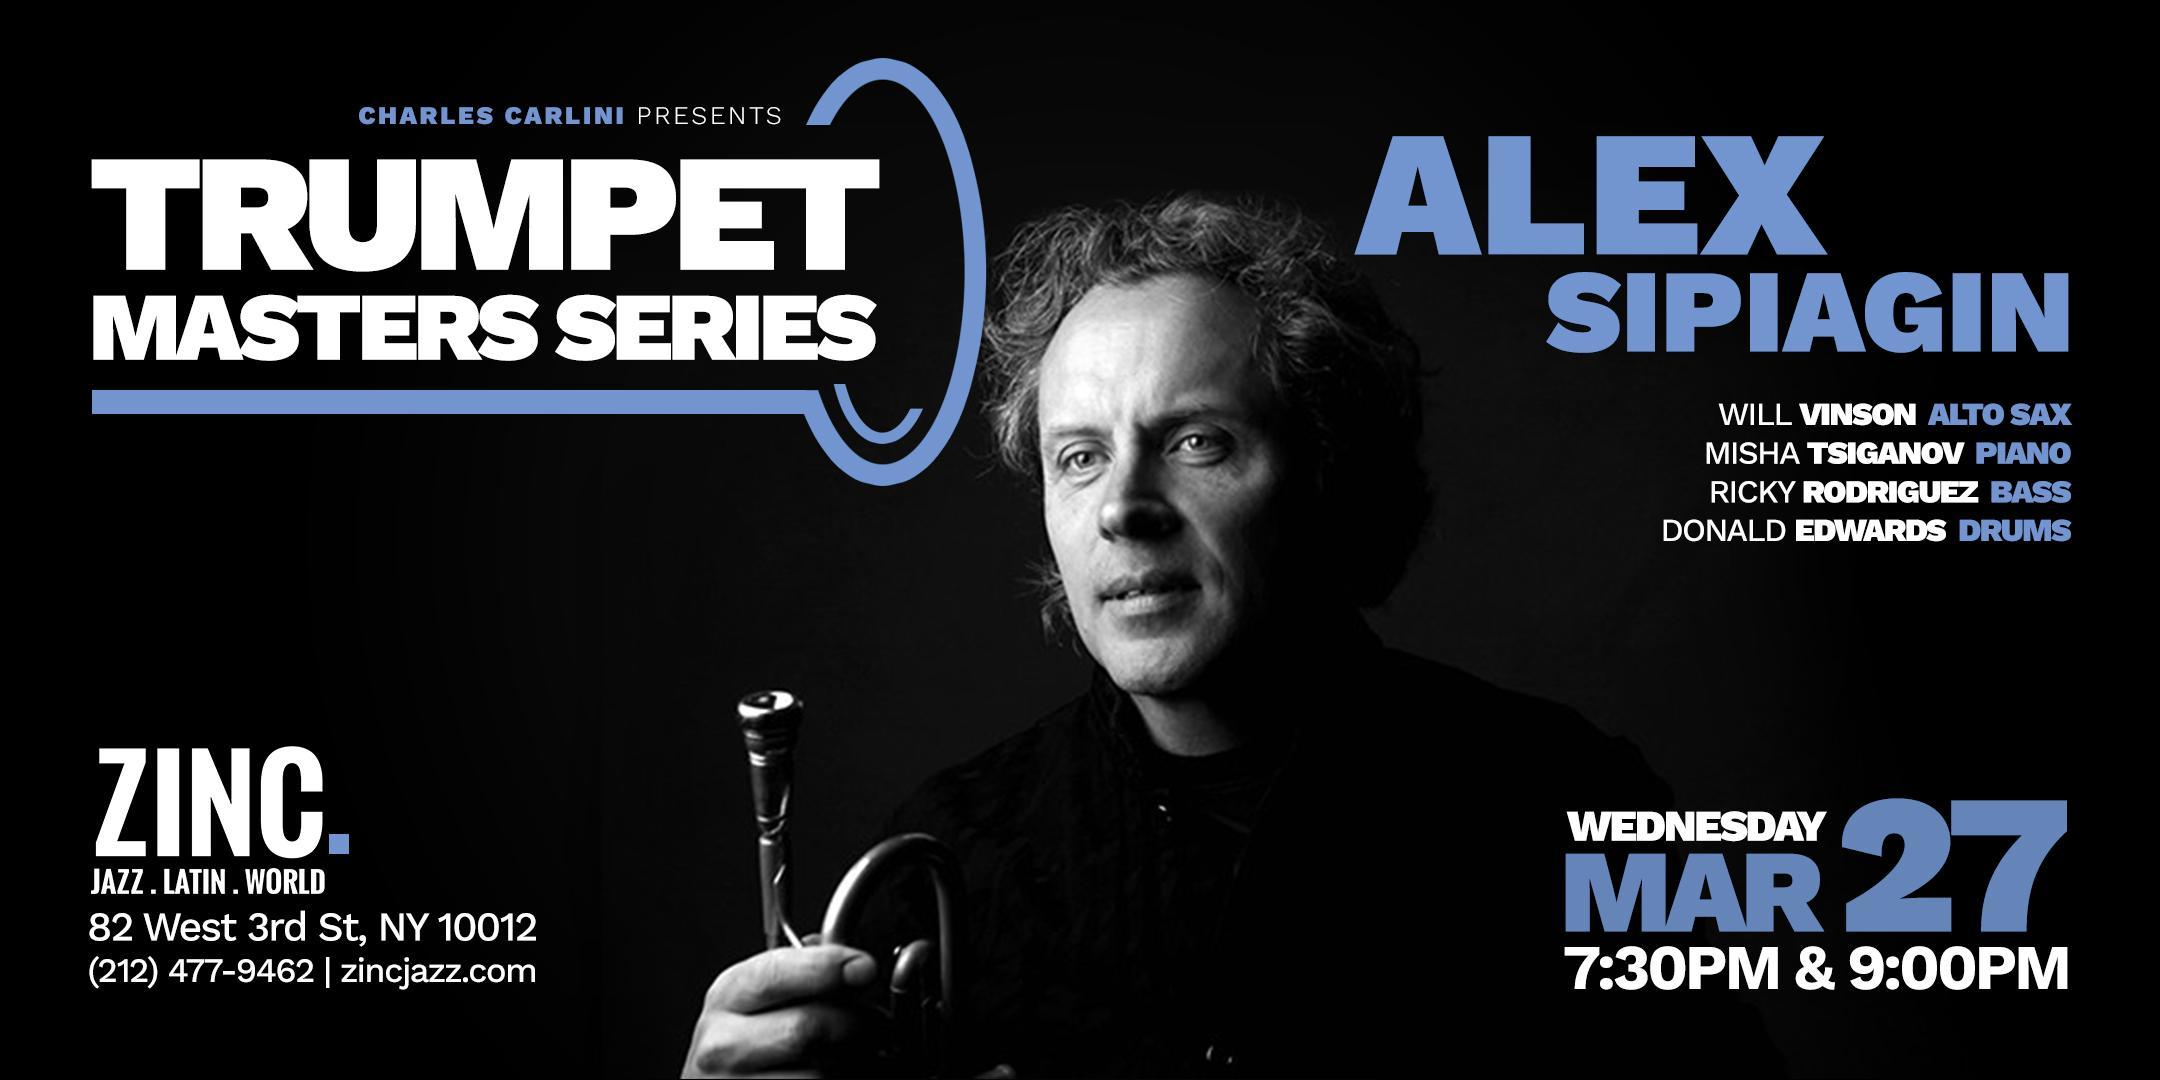 Trumpet Masters Series: Alex Sipiagin